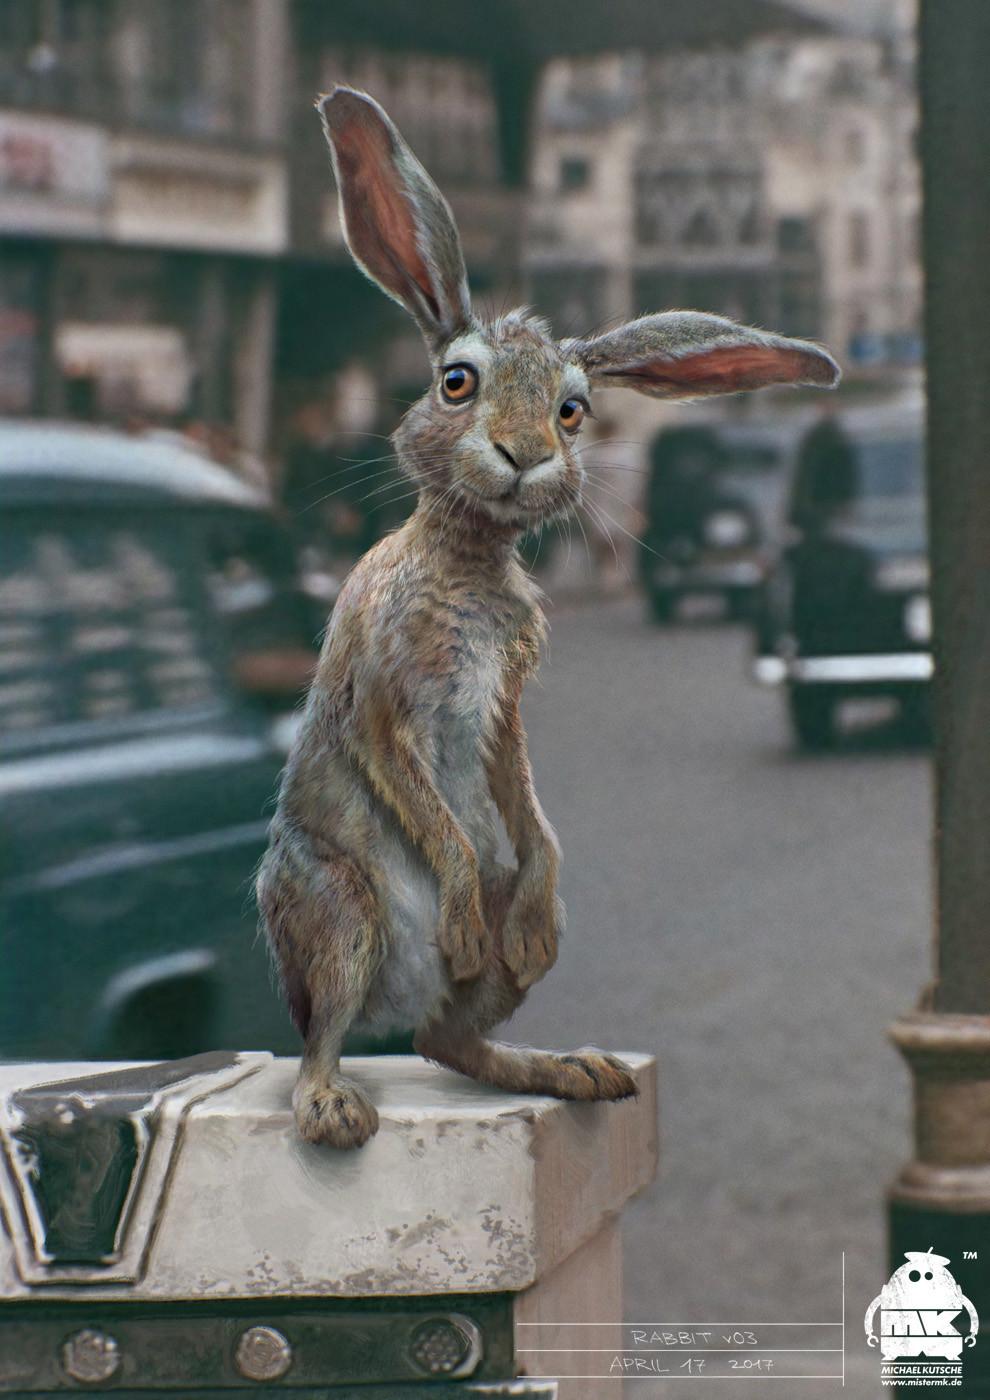 Jean-Christophe & Winnie [Disney - 2018] - Page 17 Michael-kutsche-rabbit-by-michael-kutsche